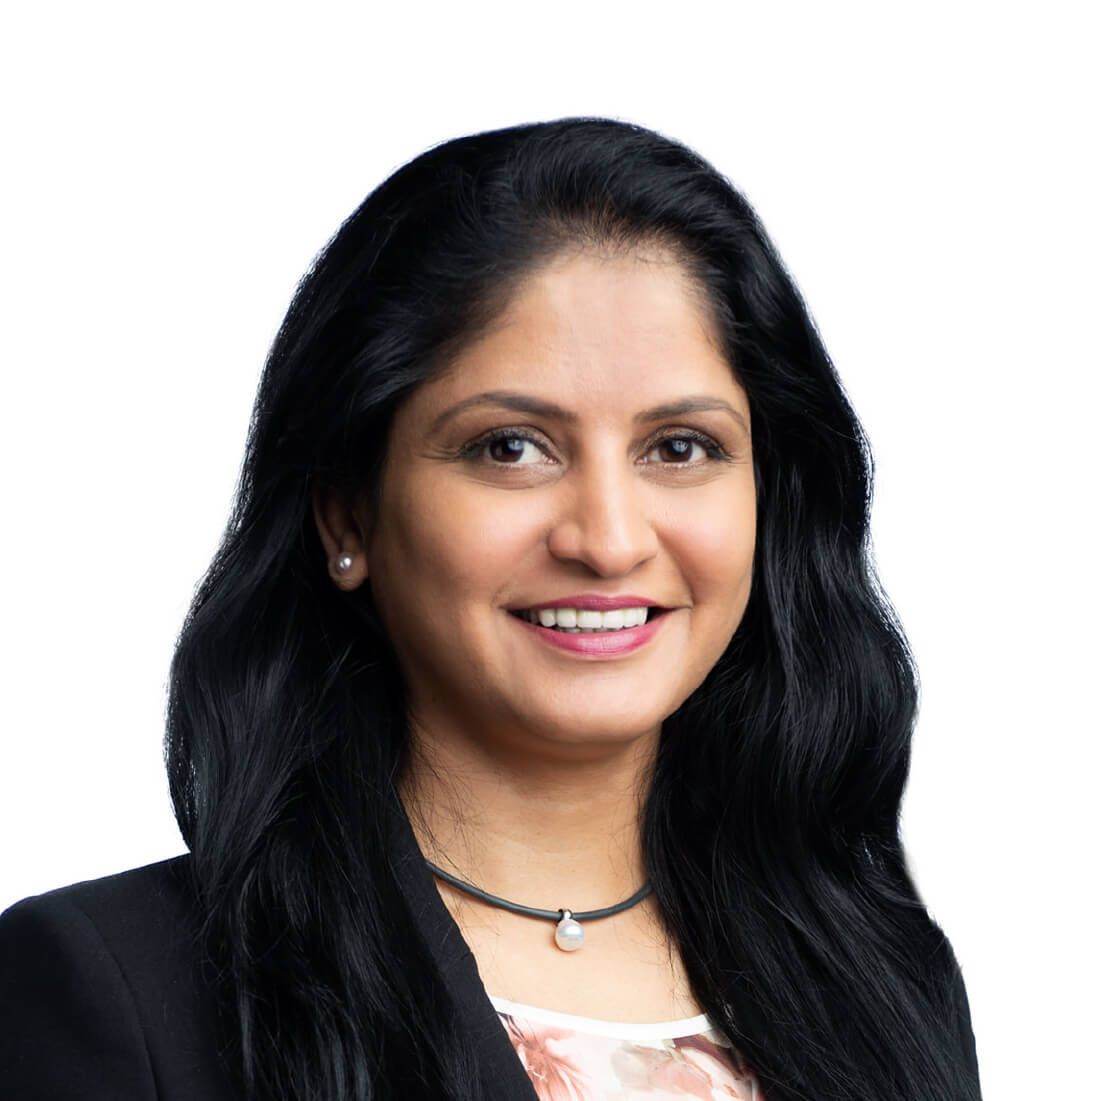 Amirtha Chetlur